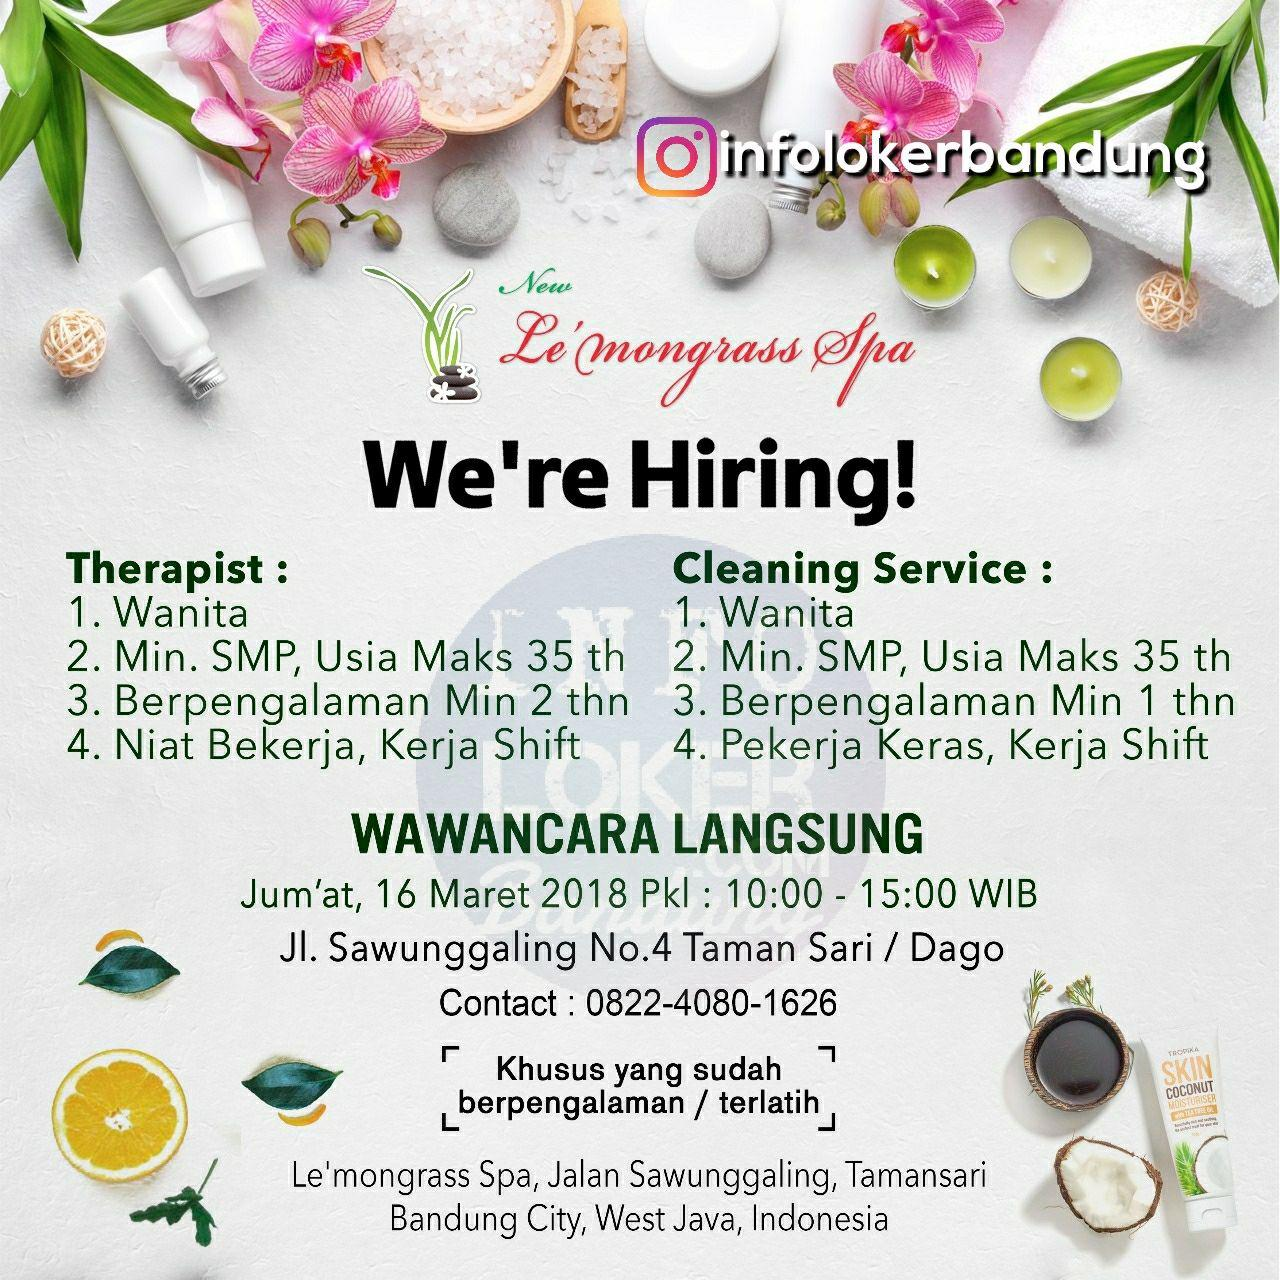 Lowngan Kerja Le'Mongrass Spa Bandung Maret 2018